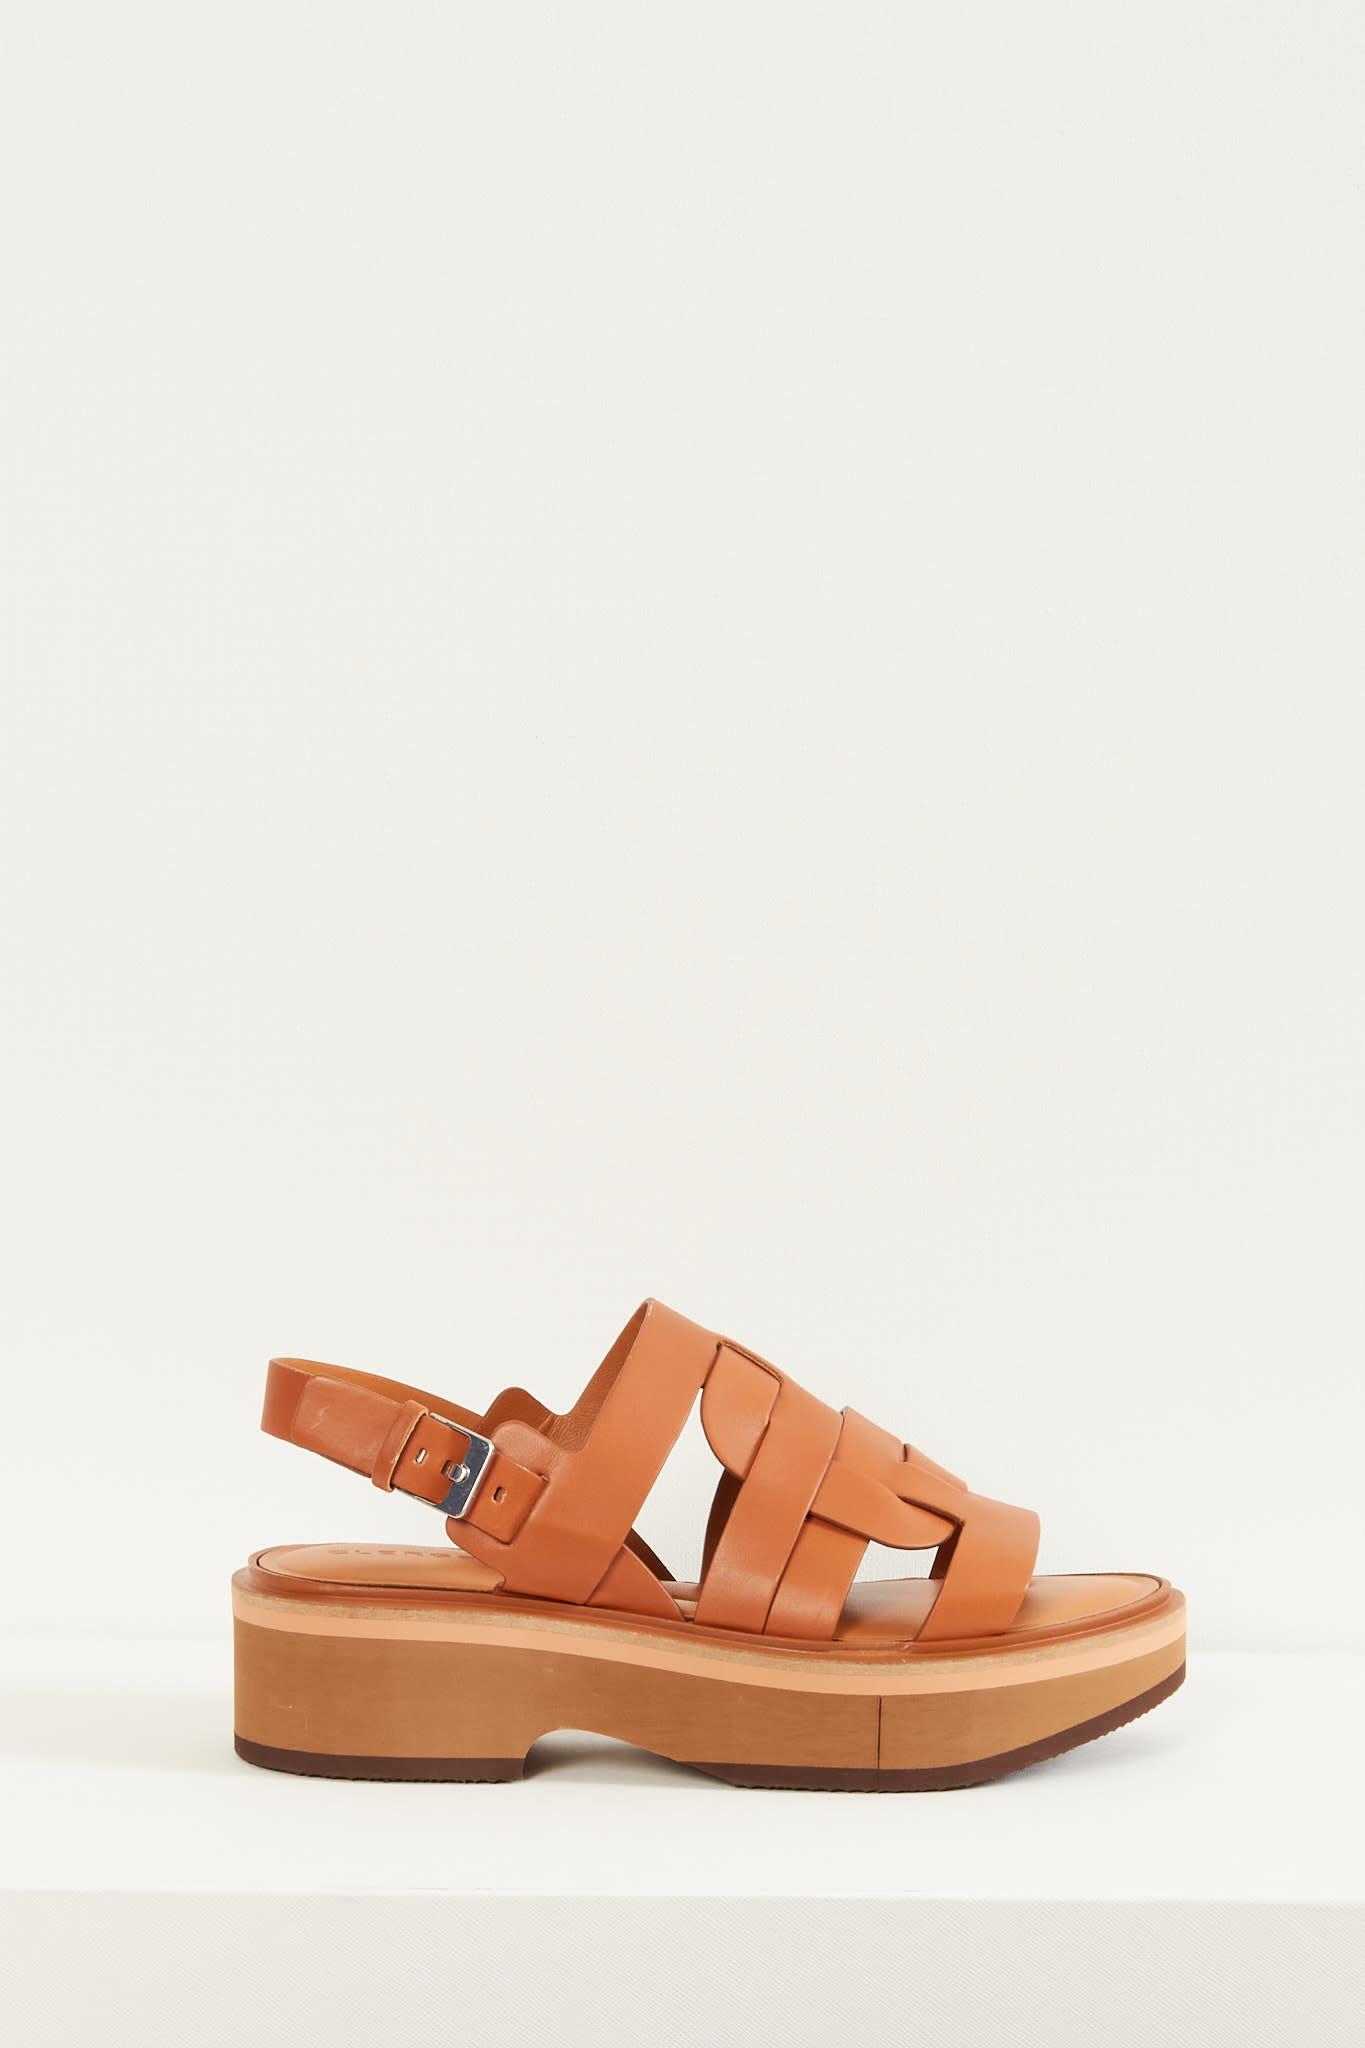 Clergerie - Fidji leather sandals